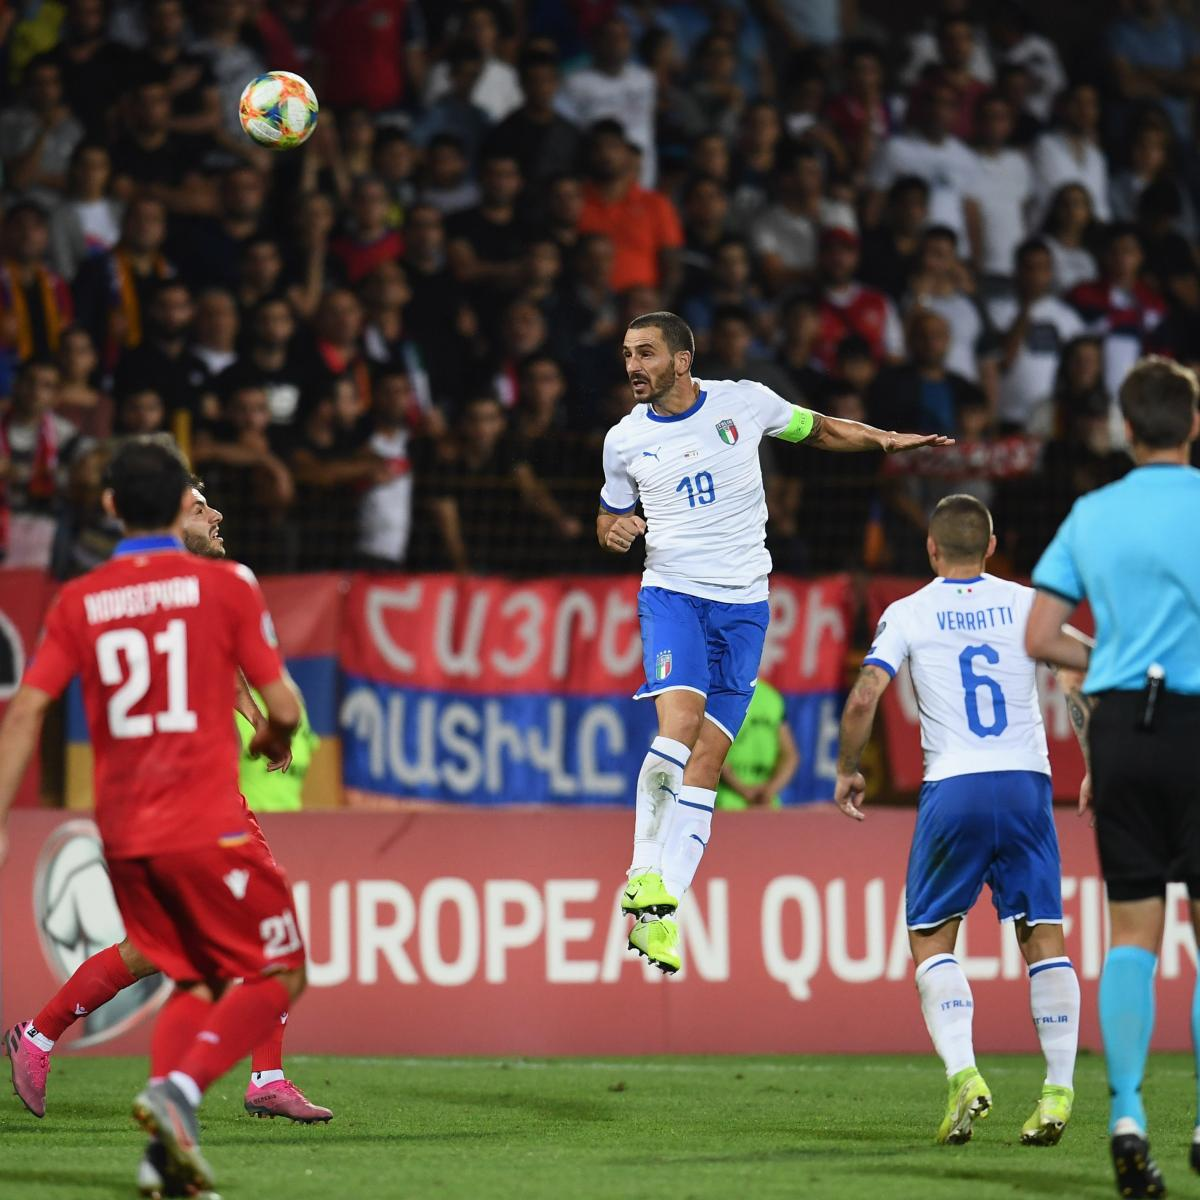 Italy vs. Armenia: Euro 2020 Qualifying Odds, Live Stream, TV Info